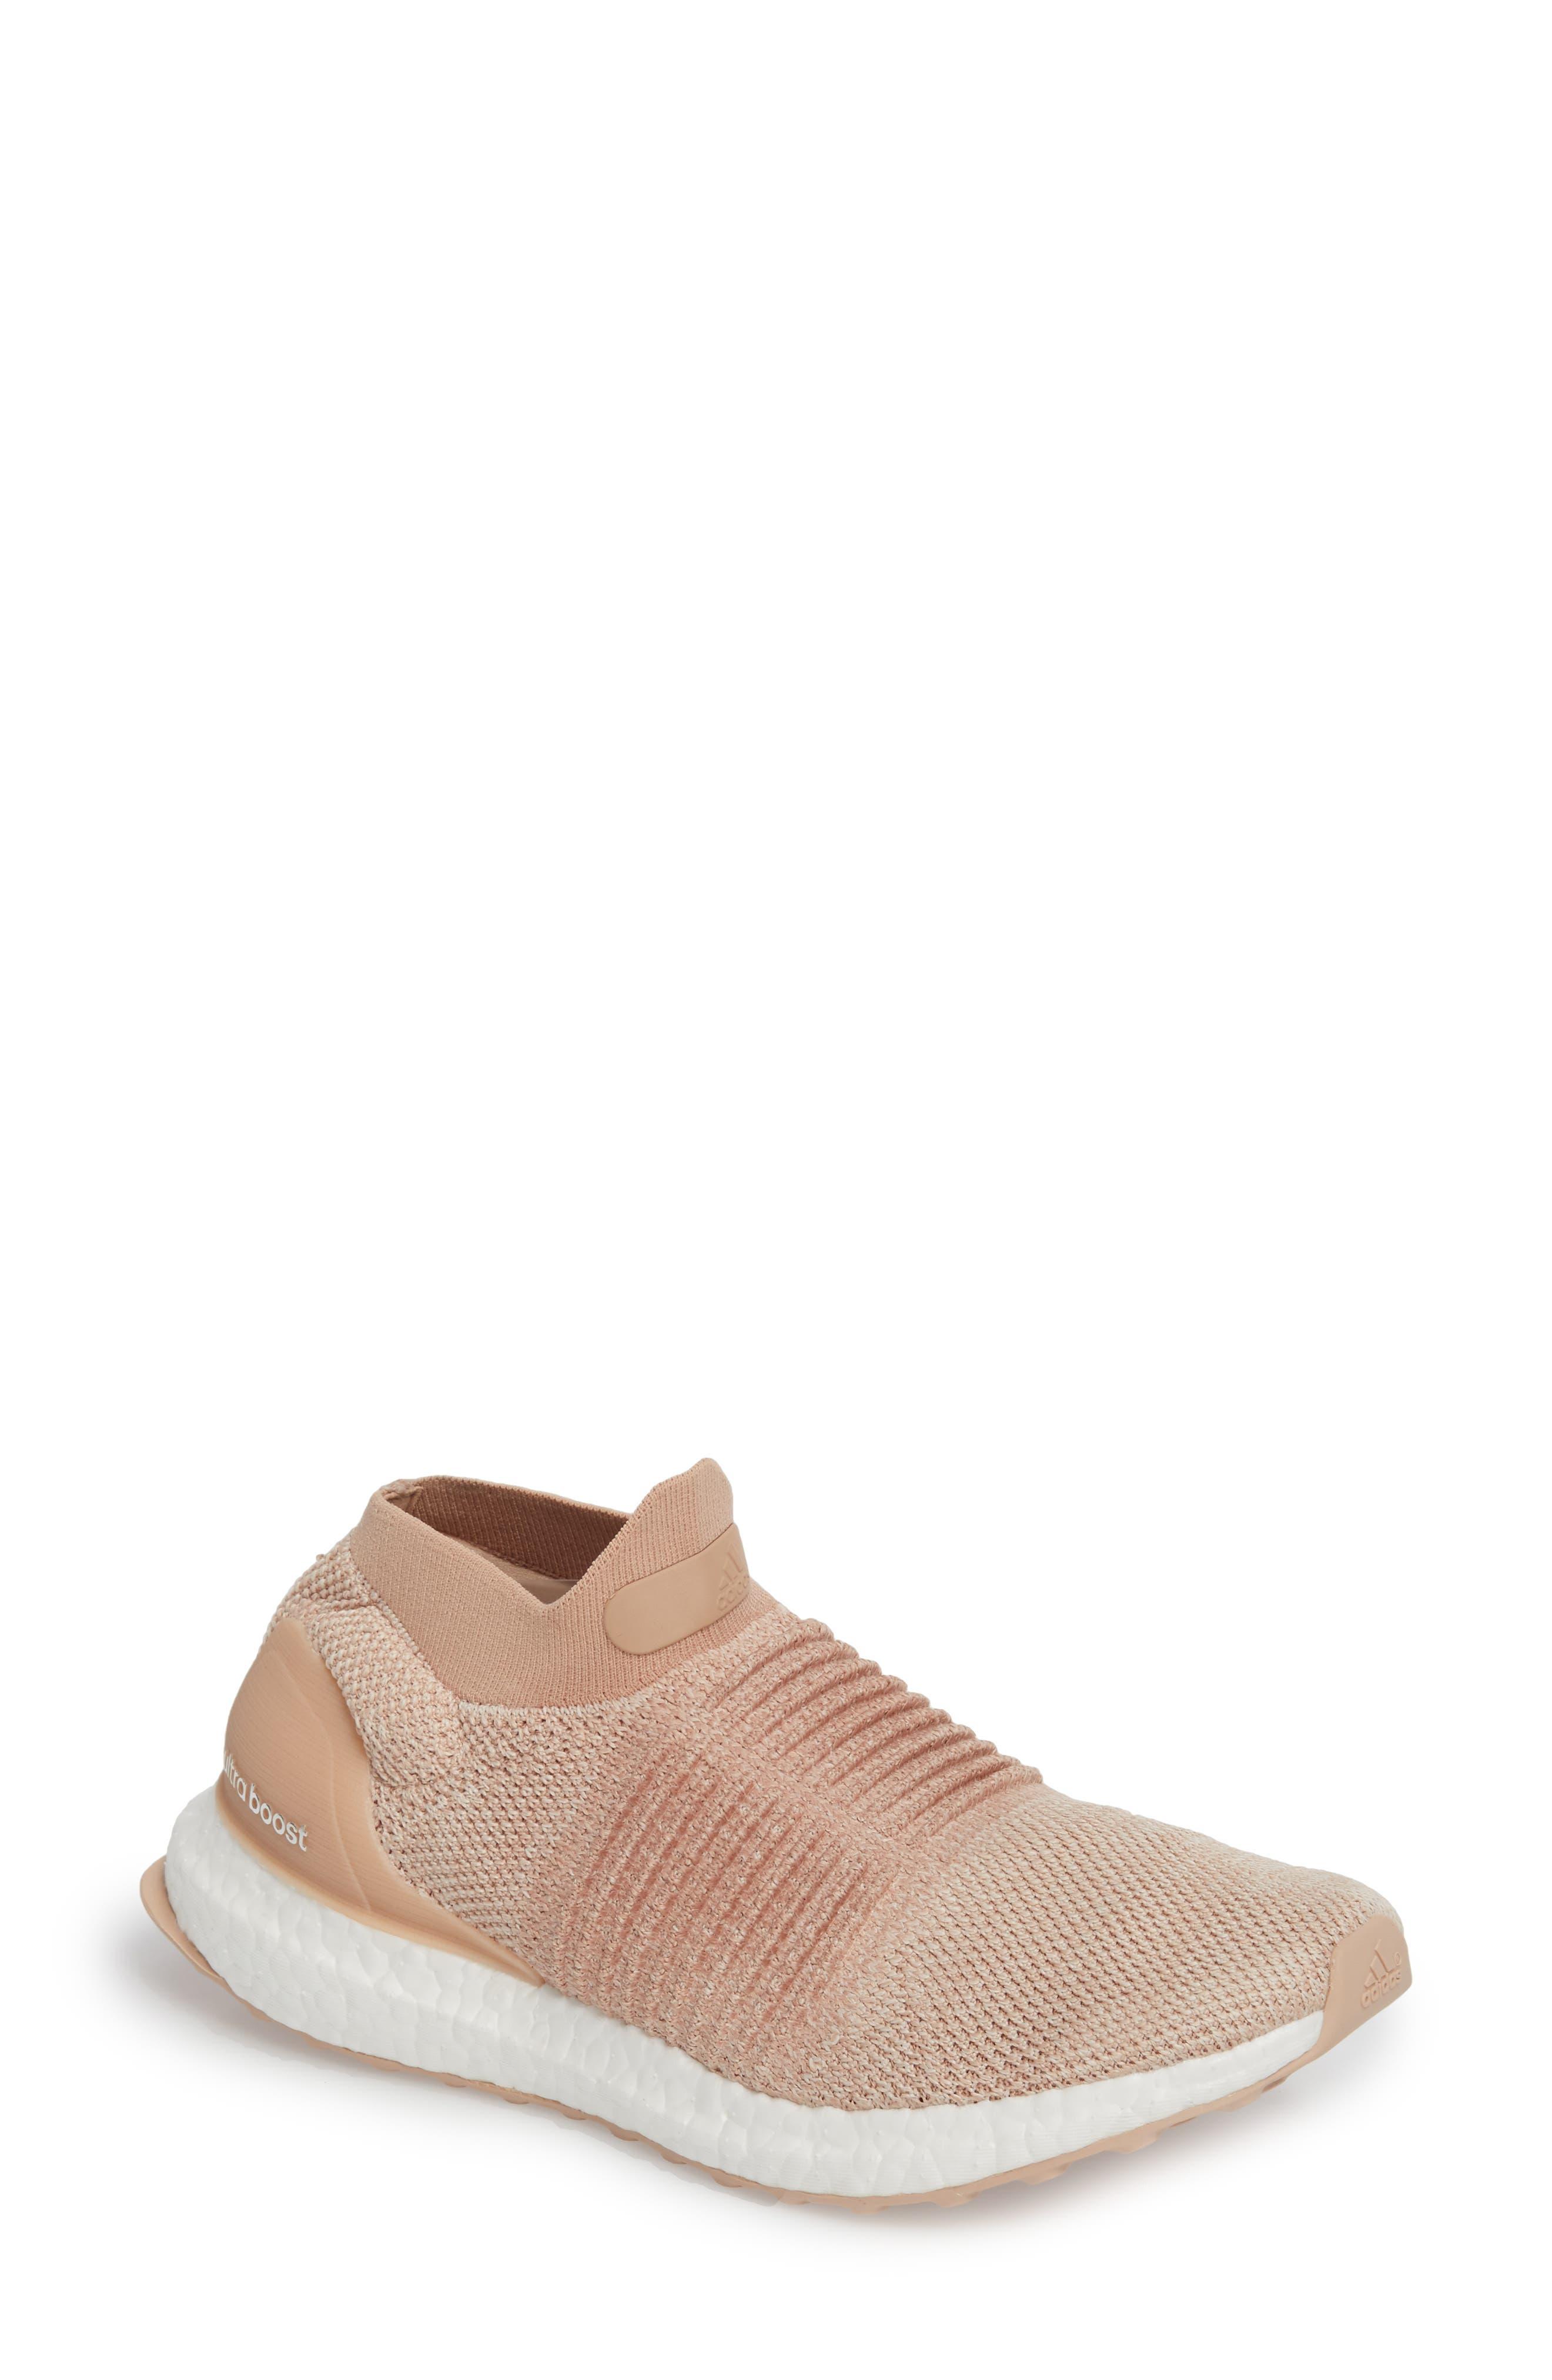 UltraBoost Laceless Running Shoe,                         Main,                         color, Ash Pearl/ Ash Pearl